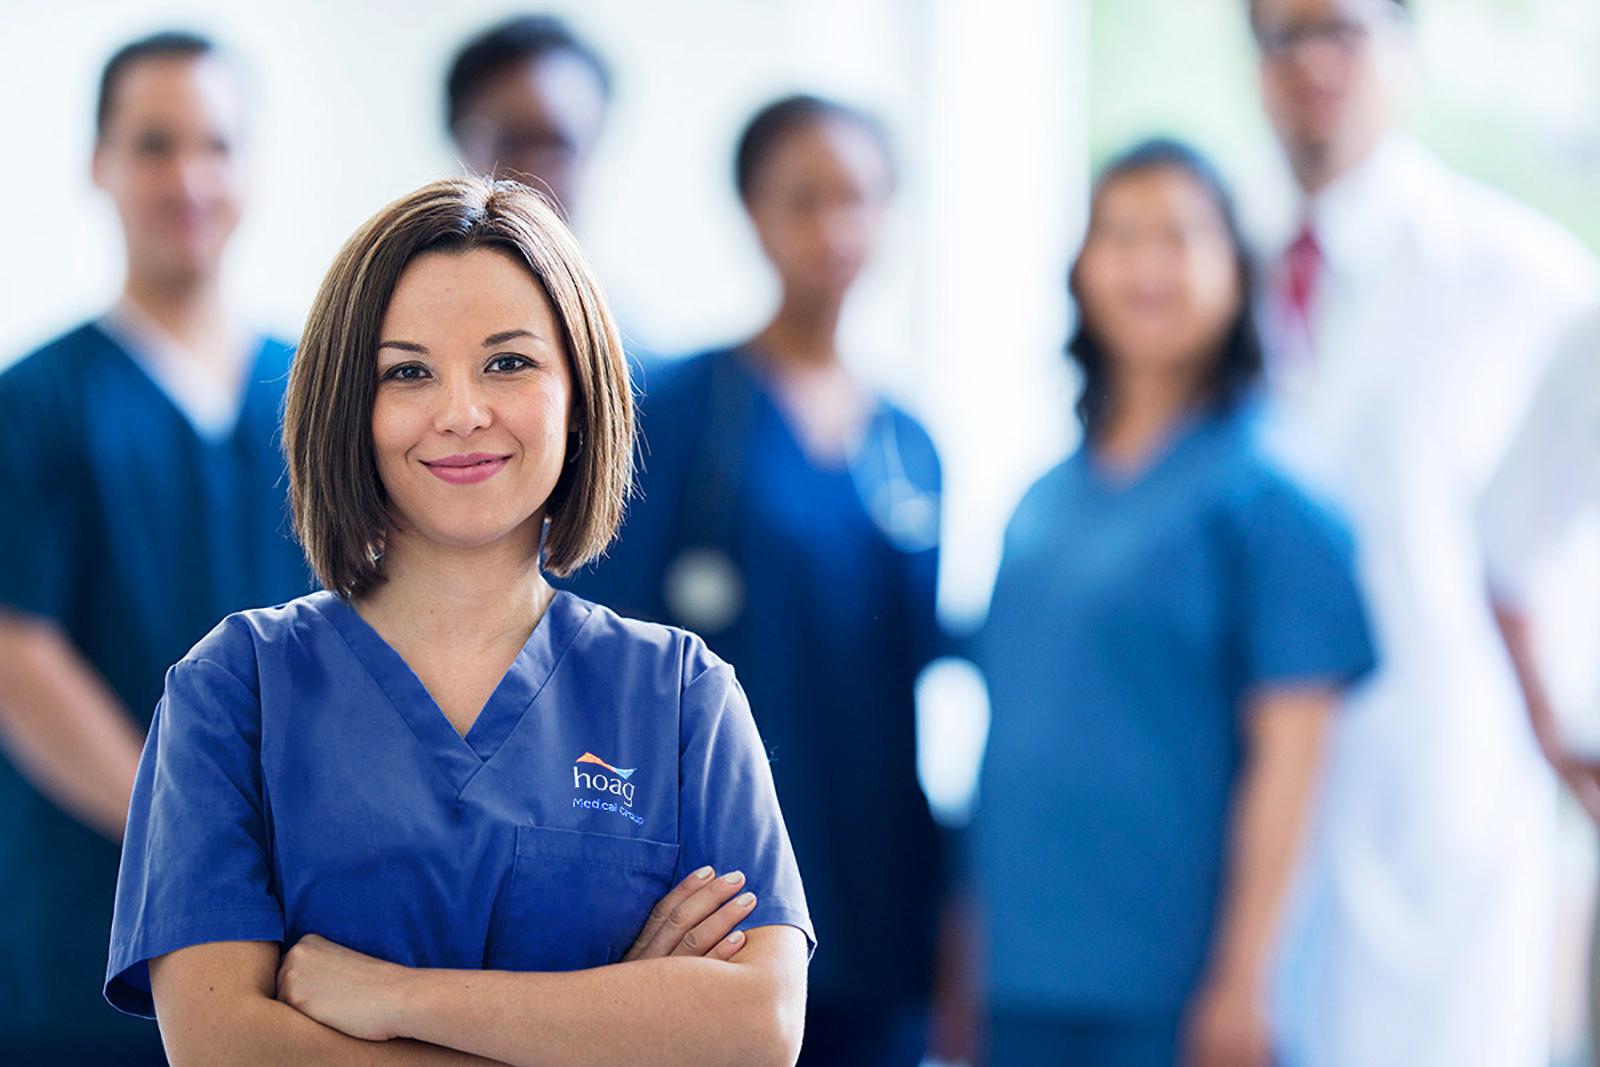 New Grad Nurses